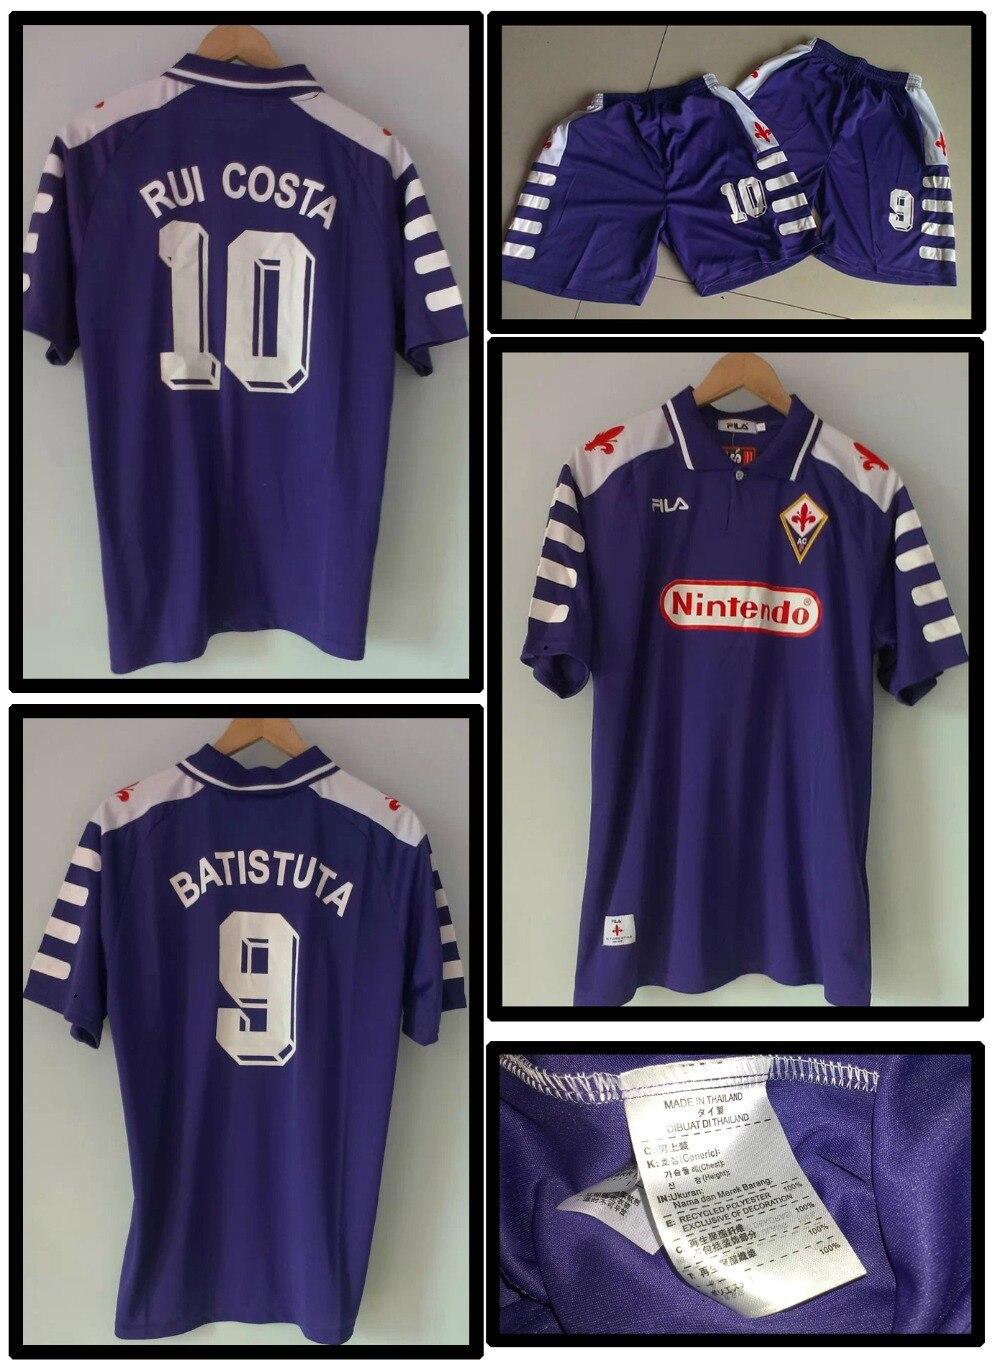 Retro Jersey Fiorentina Batistuta Rui Costa temporada 98